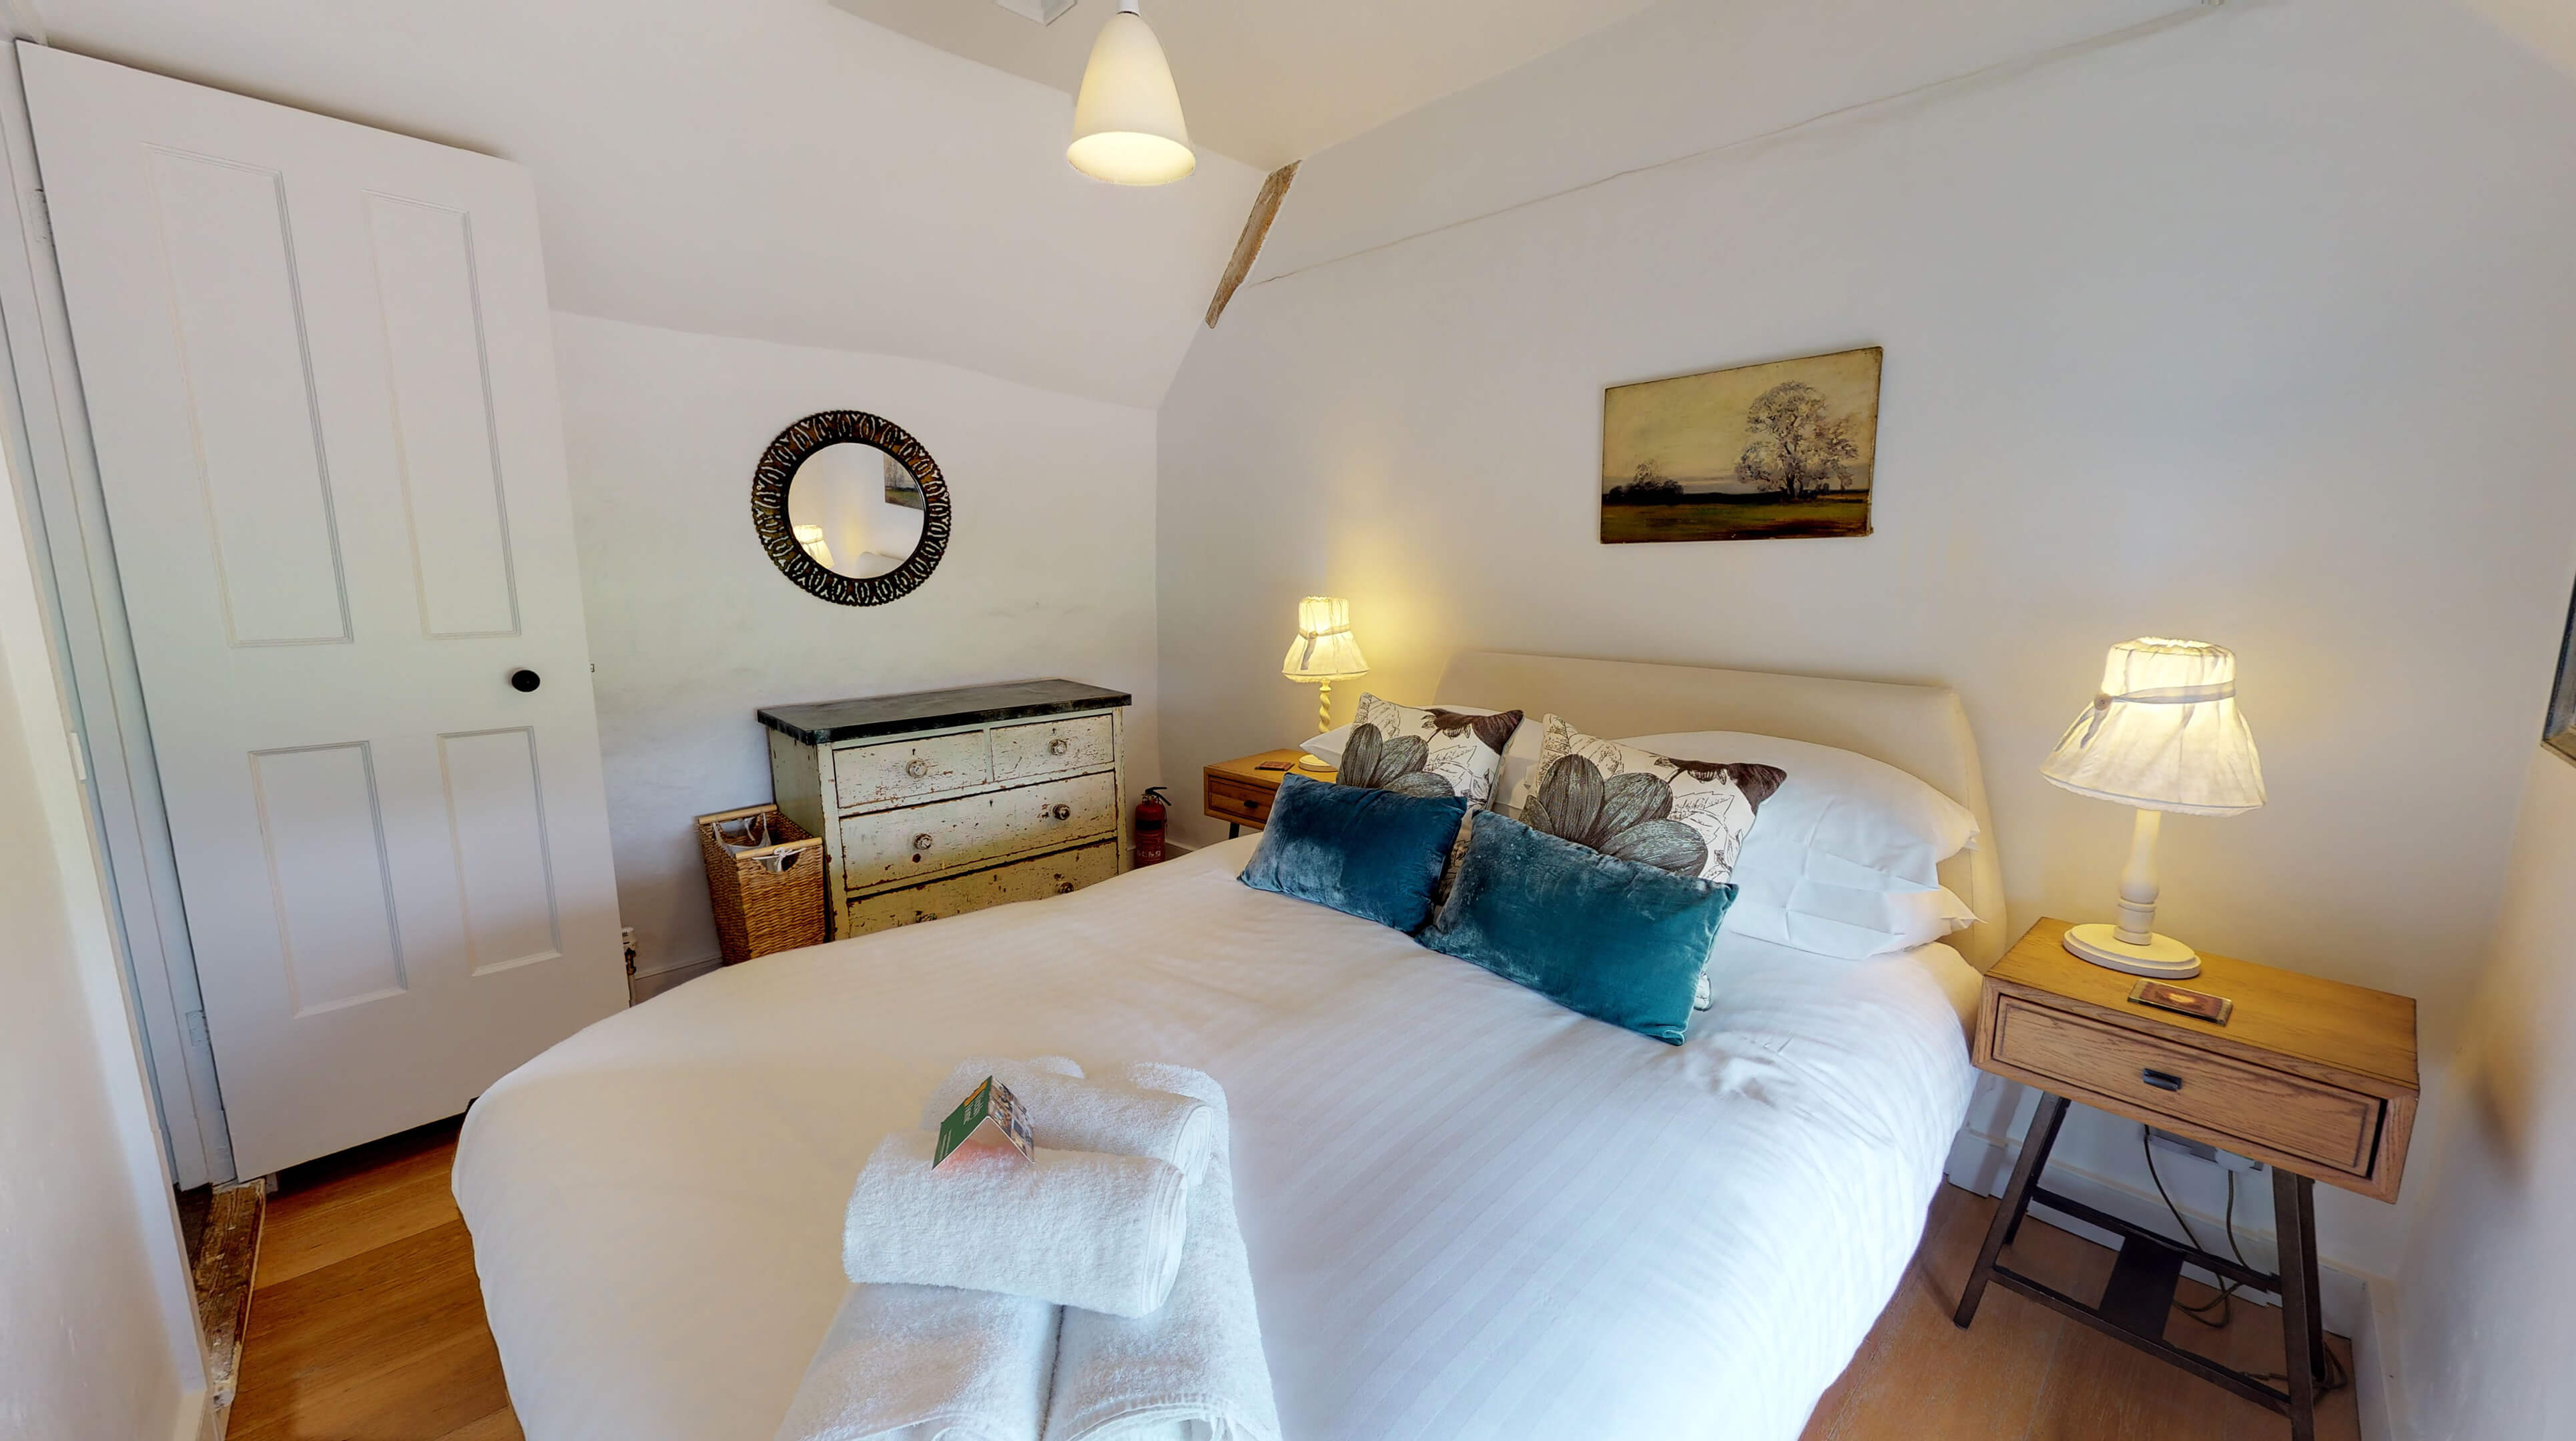 Lower Heyford Three Bedroom Coopers Cottage Bedroom One 3